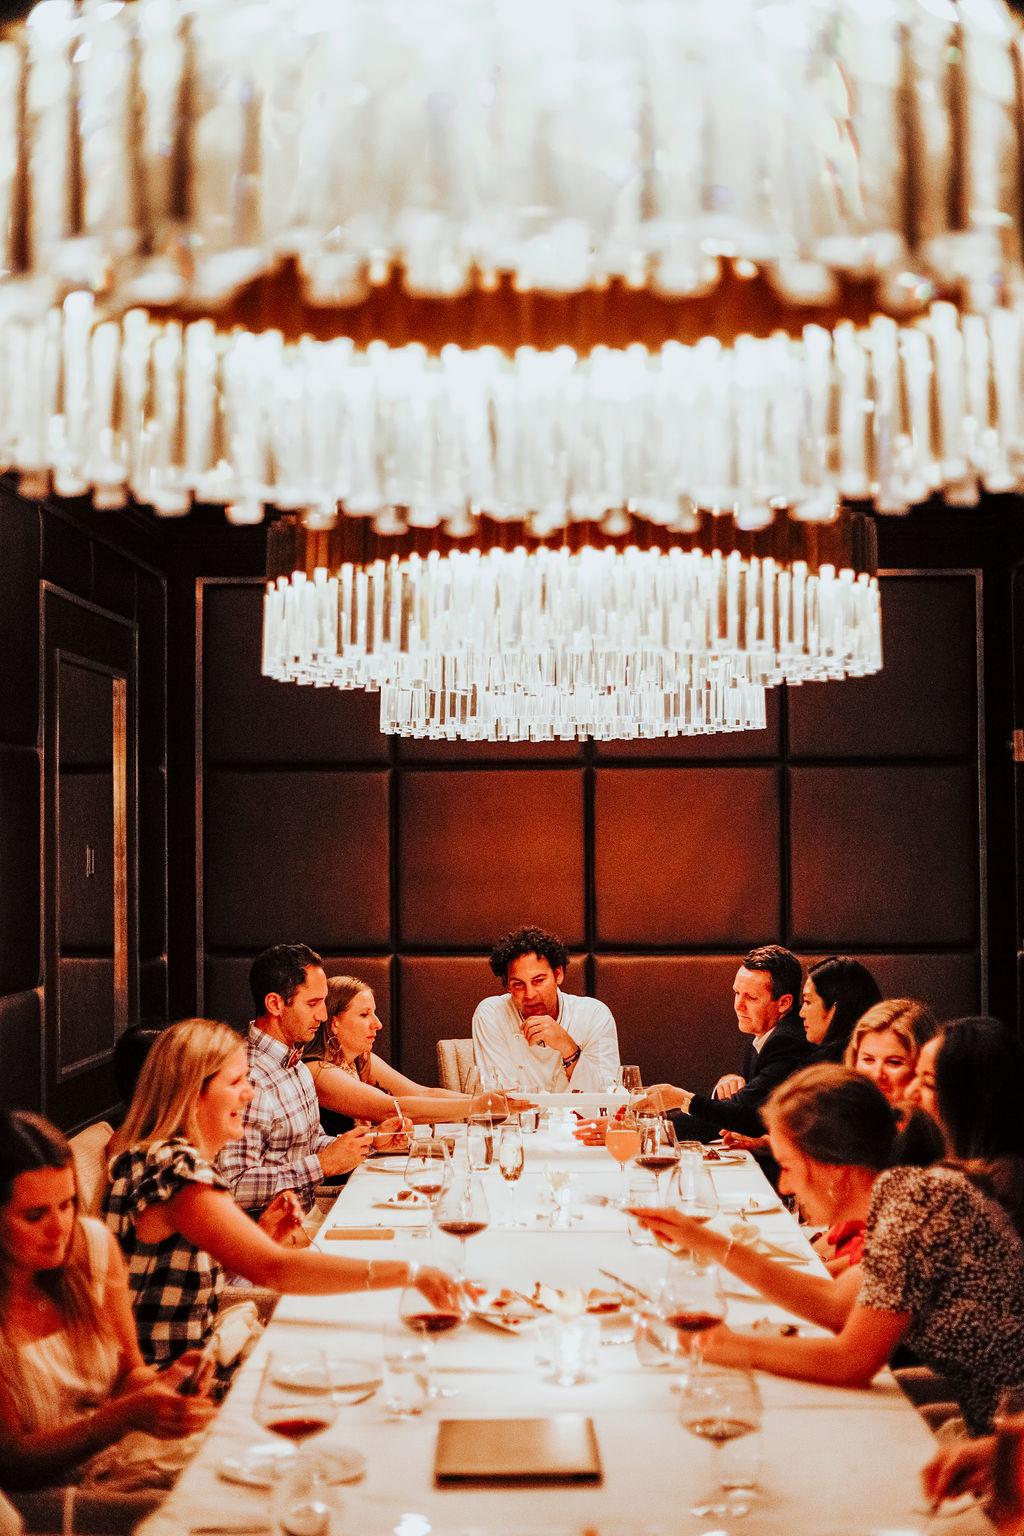 Influencers at dinner, Hotel Bennet